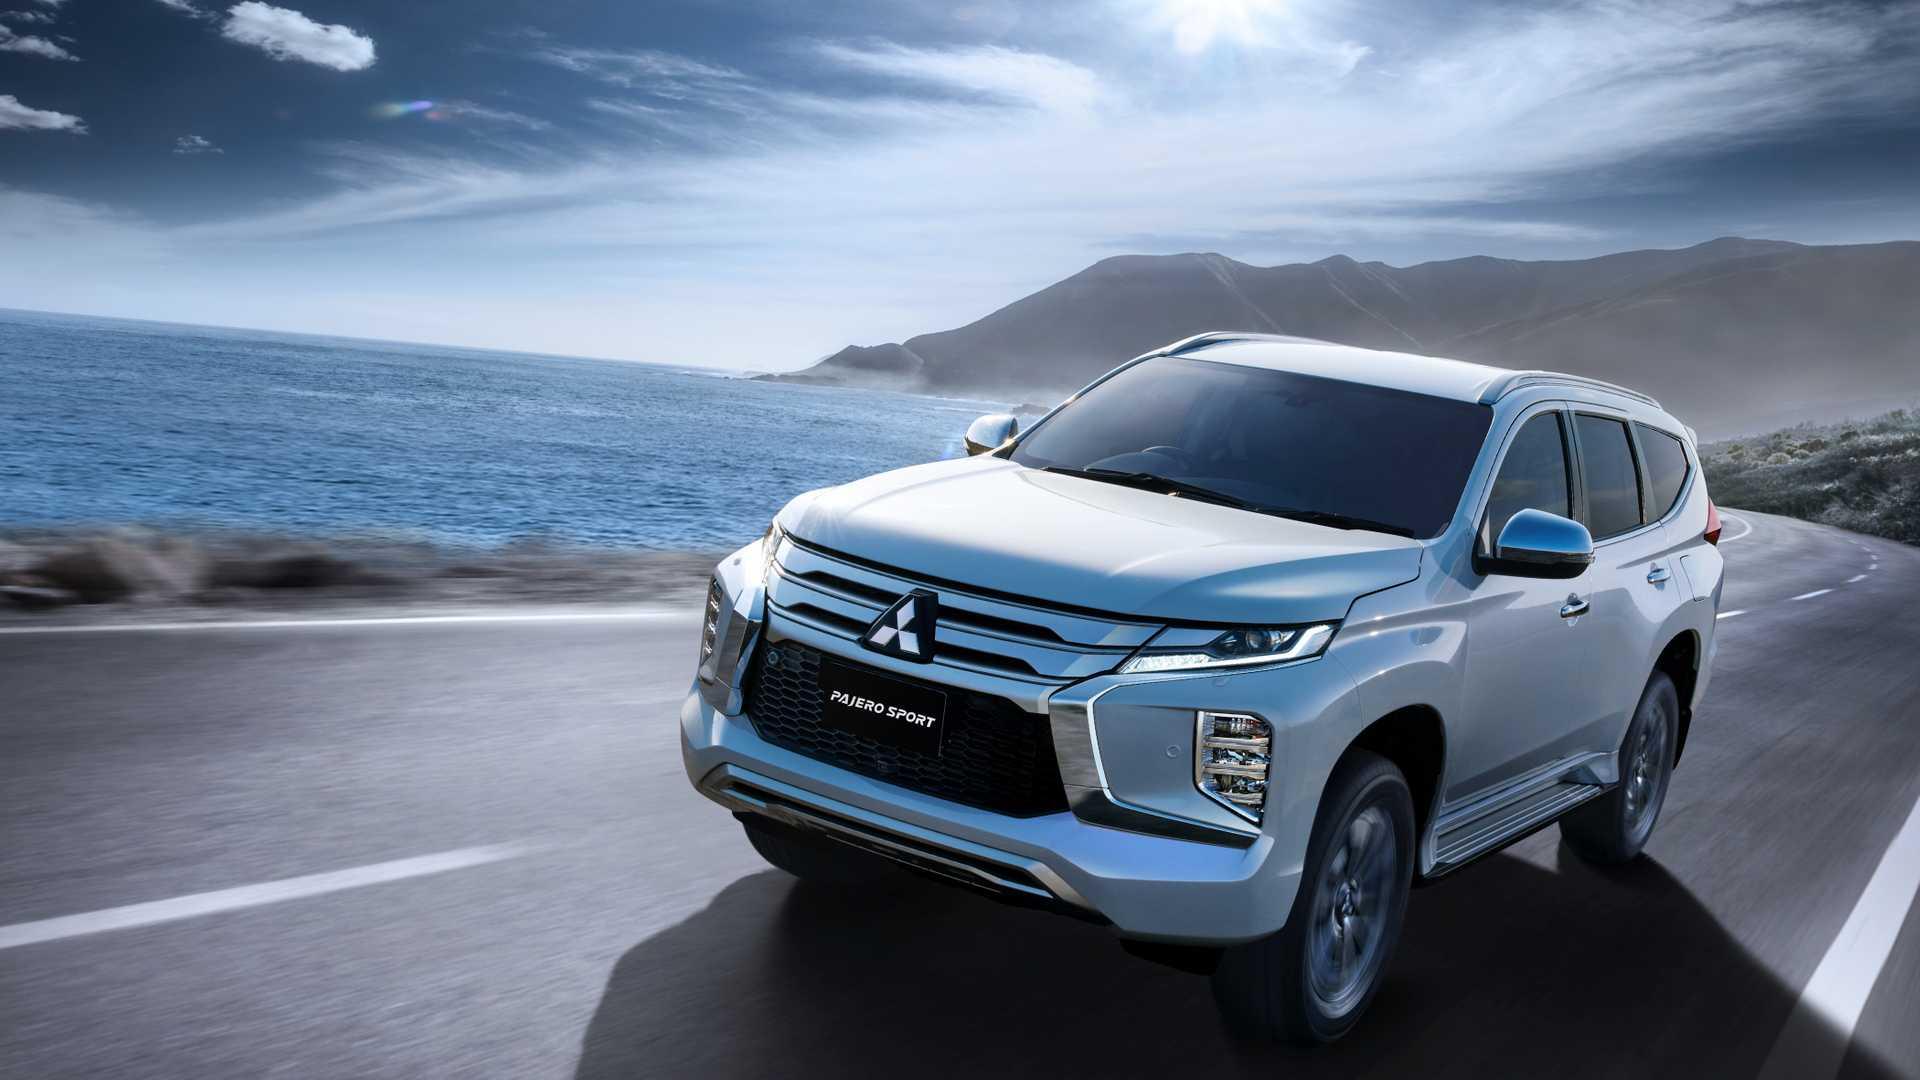 2020_Mitsubishi_Pajero_Sport_facelift_0007